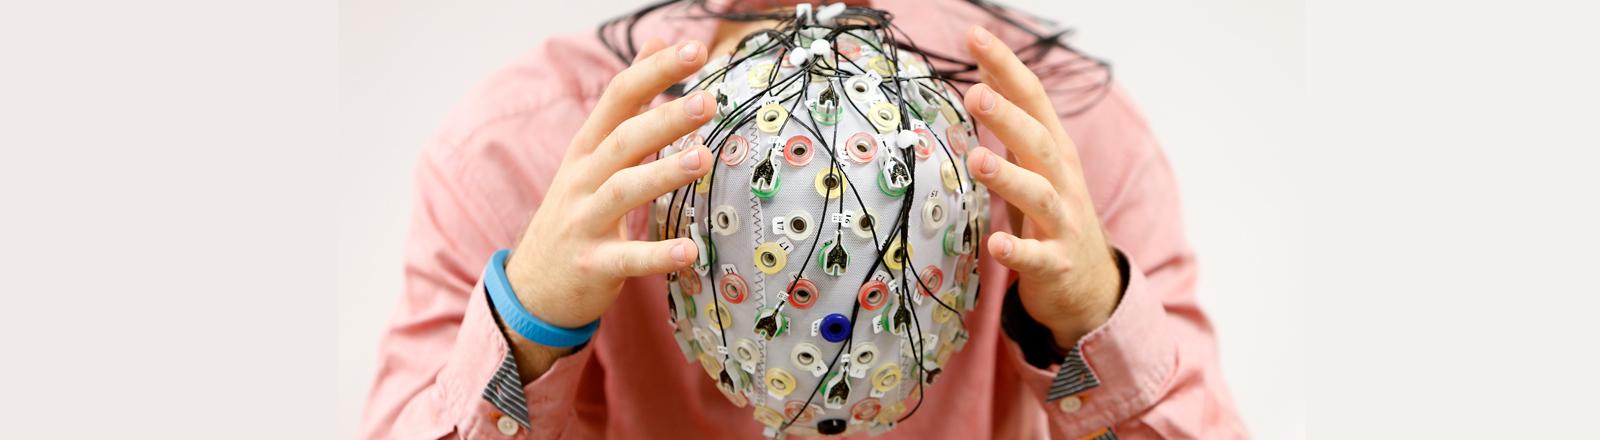 EEG Elektroenzephalogram